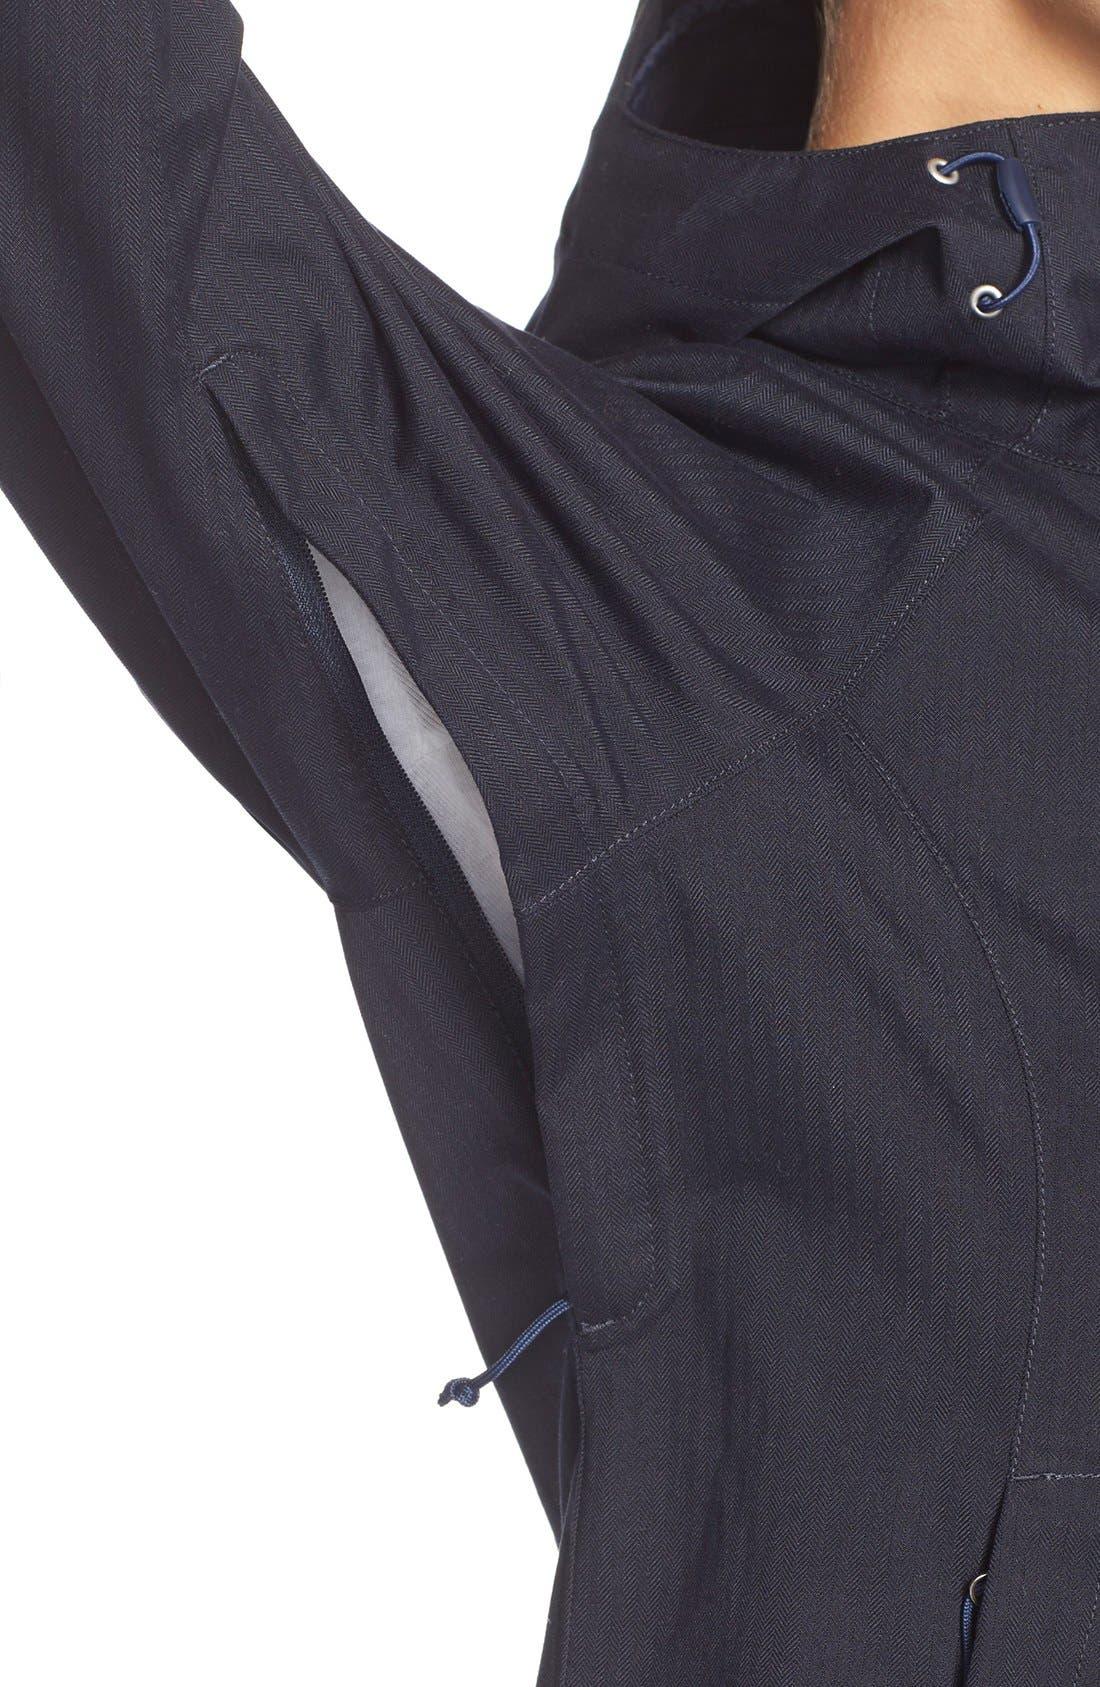 Alternate Image 4  - The North Face 'Magnolia' Waterproof Rain Jacket (Nordstrom Exclusive)